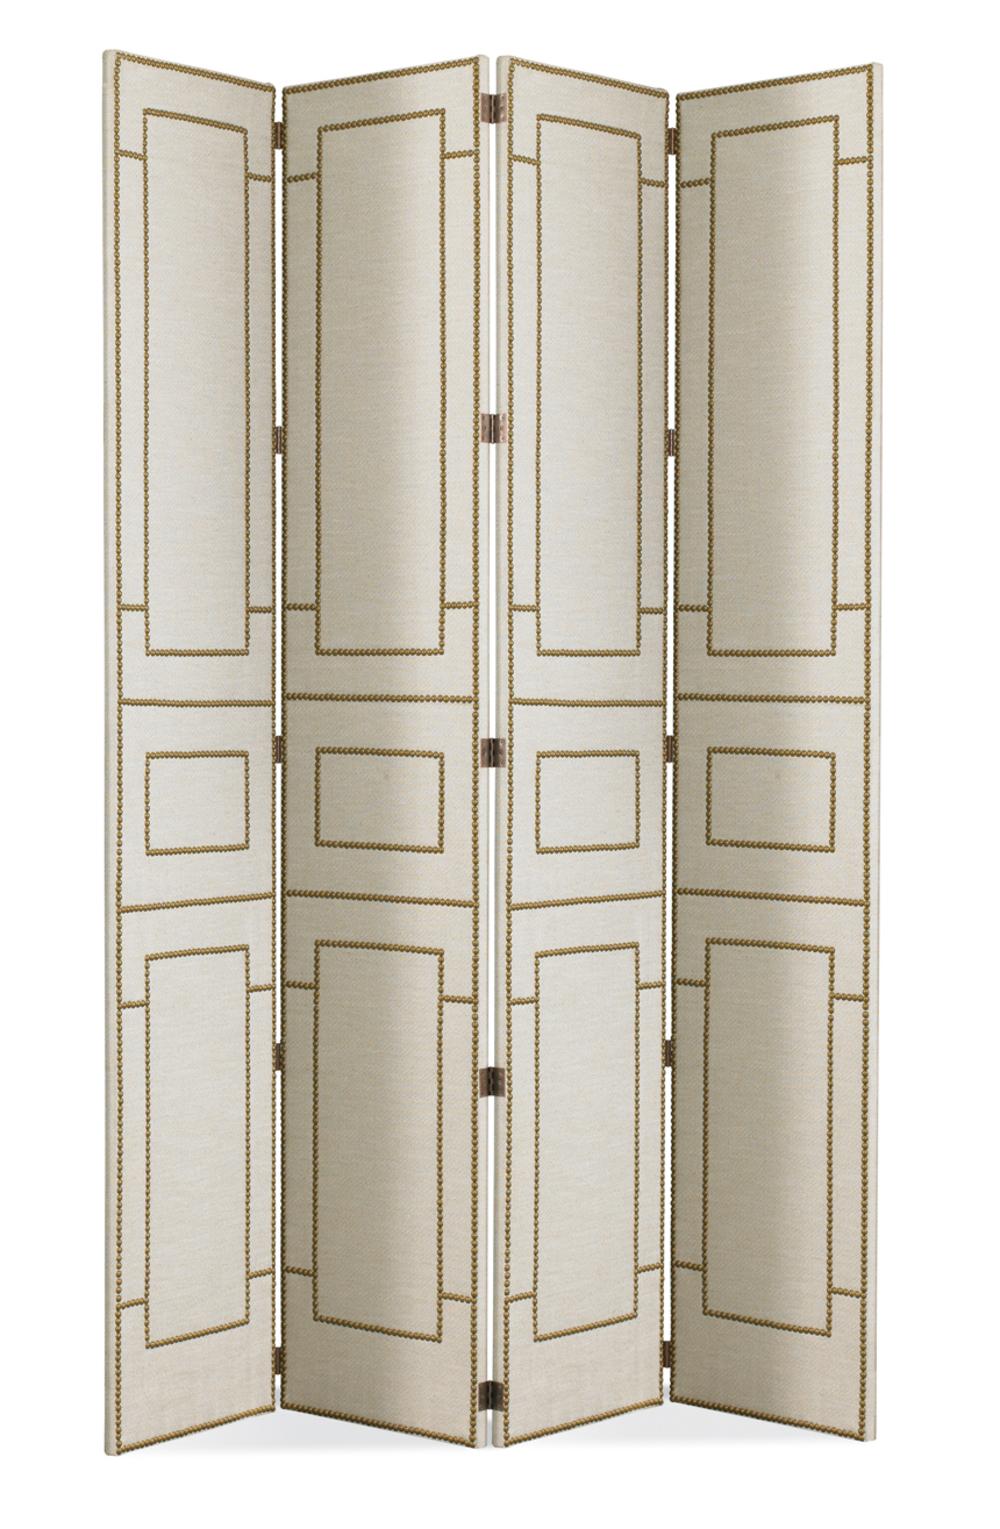 Mr. and Mrs. Howard by Sherrill Furniture - Mondrian Screen